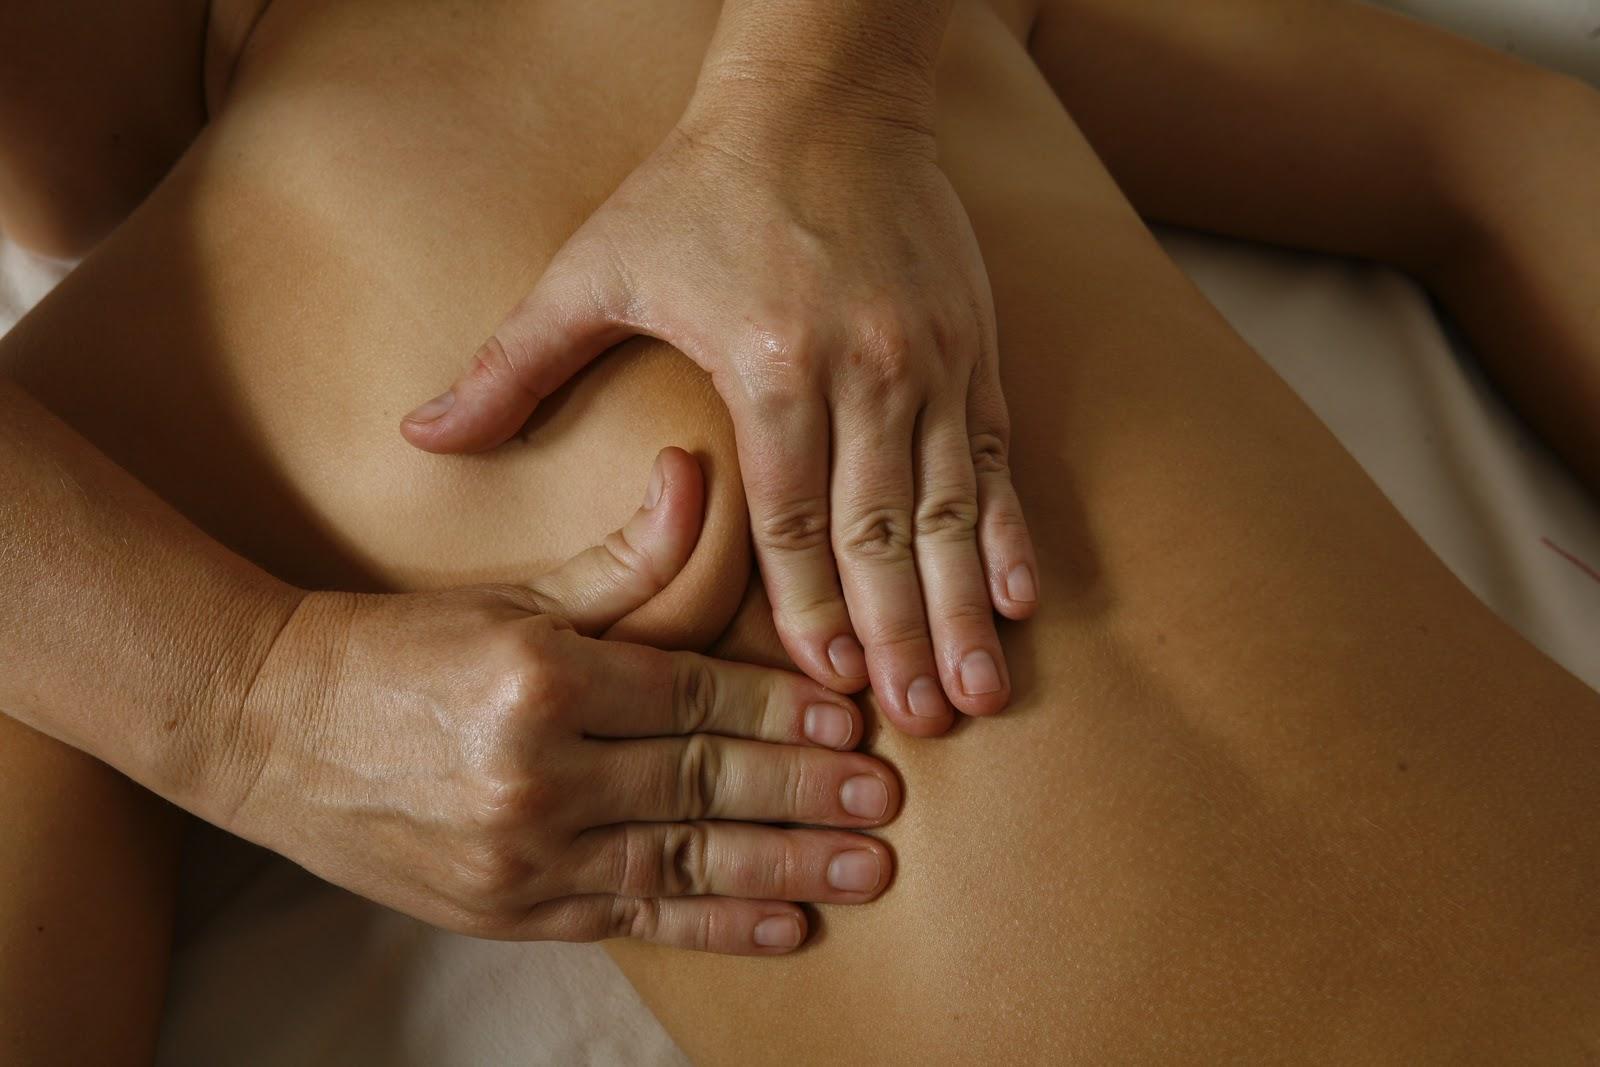 Фото інцест масаж 14 фотография